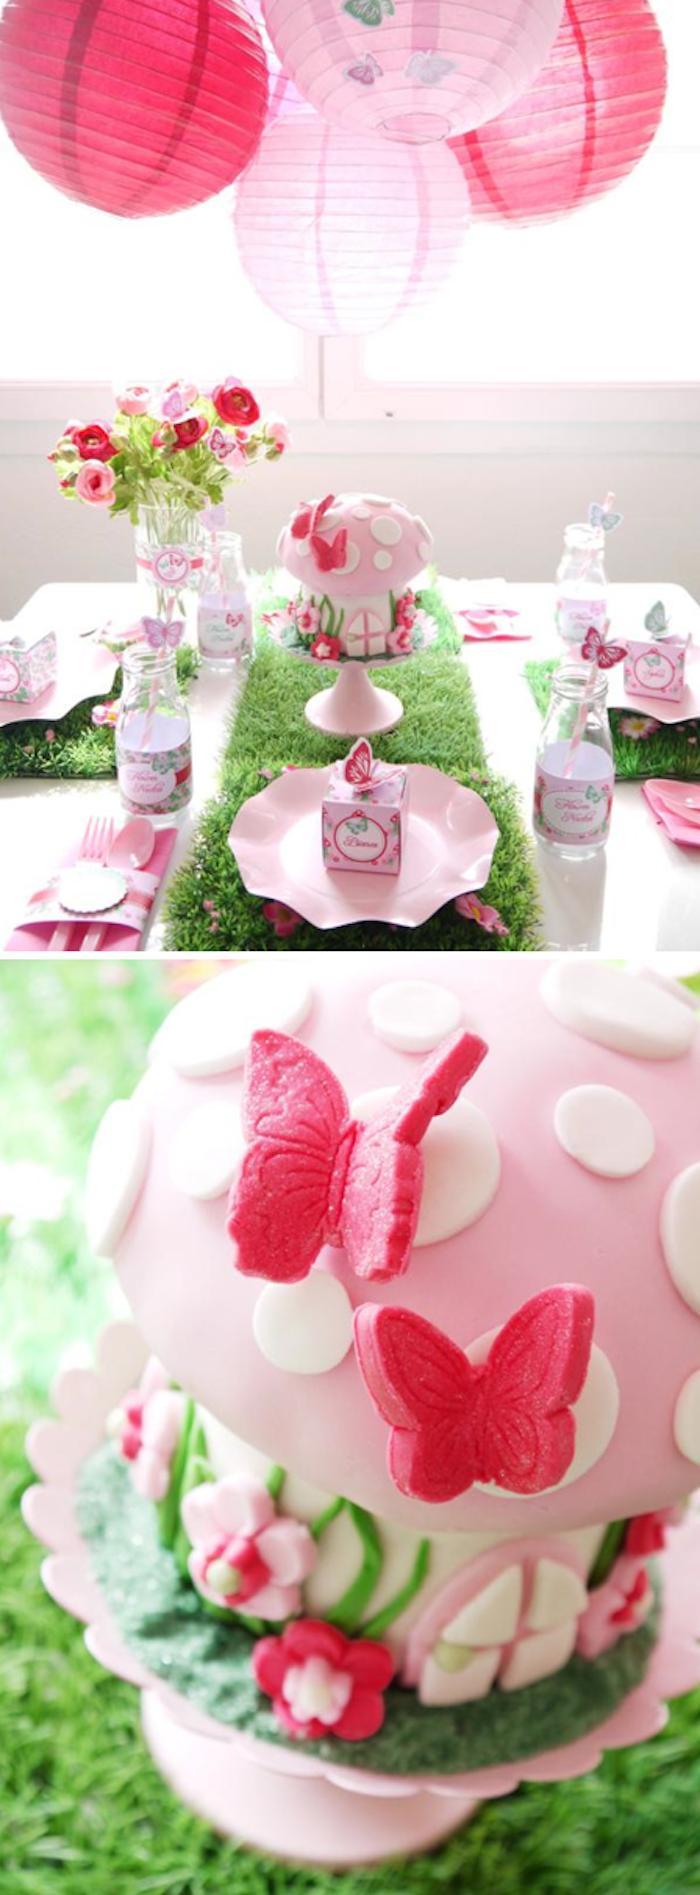 Woodland Fairy Pixie themed birthday party with SO MANY CUTE IDEAS! Via Kara's Party Ideas KarasPartyIdeas.com #fairy #woodland #pixie #themed #birthday #party #cake #idea #supplies #decor #idea